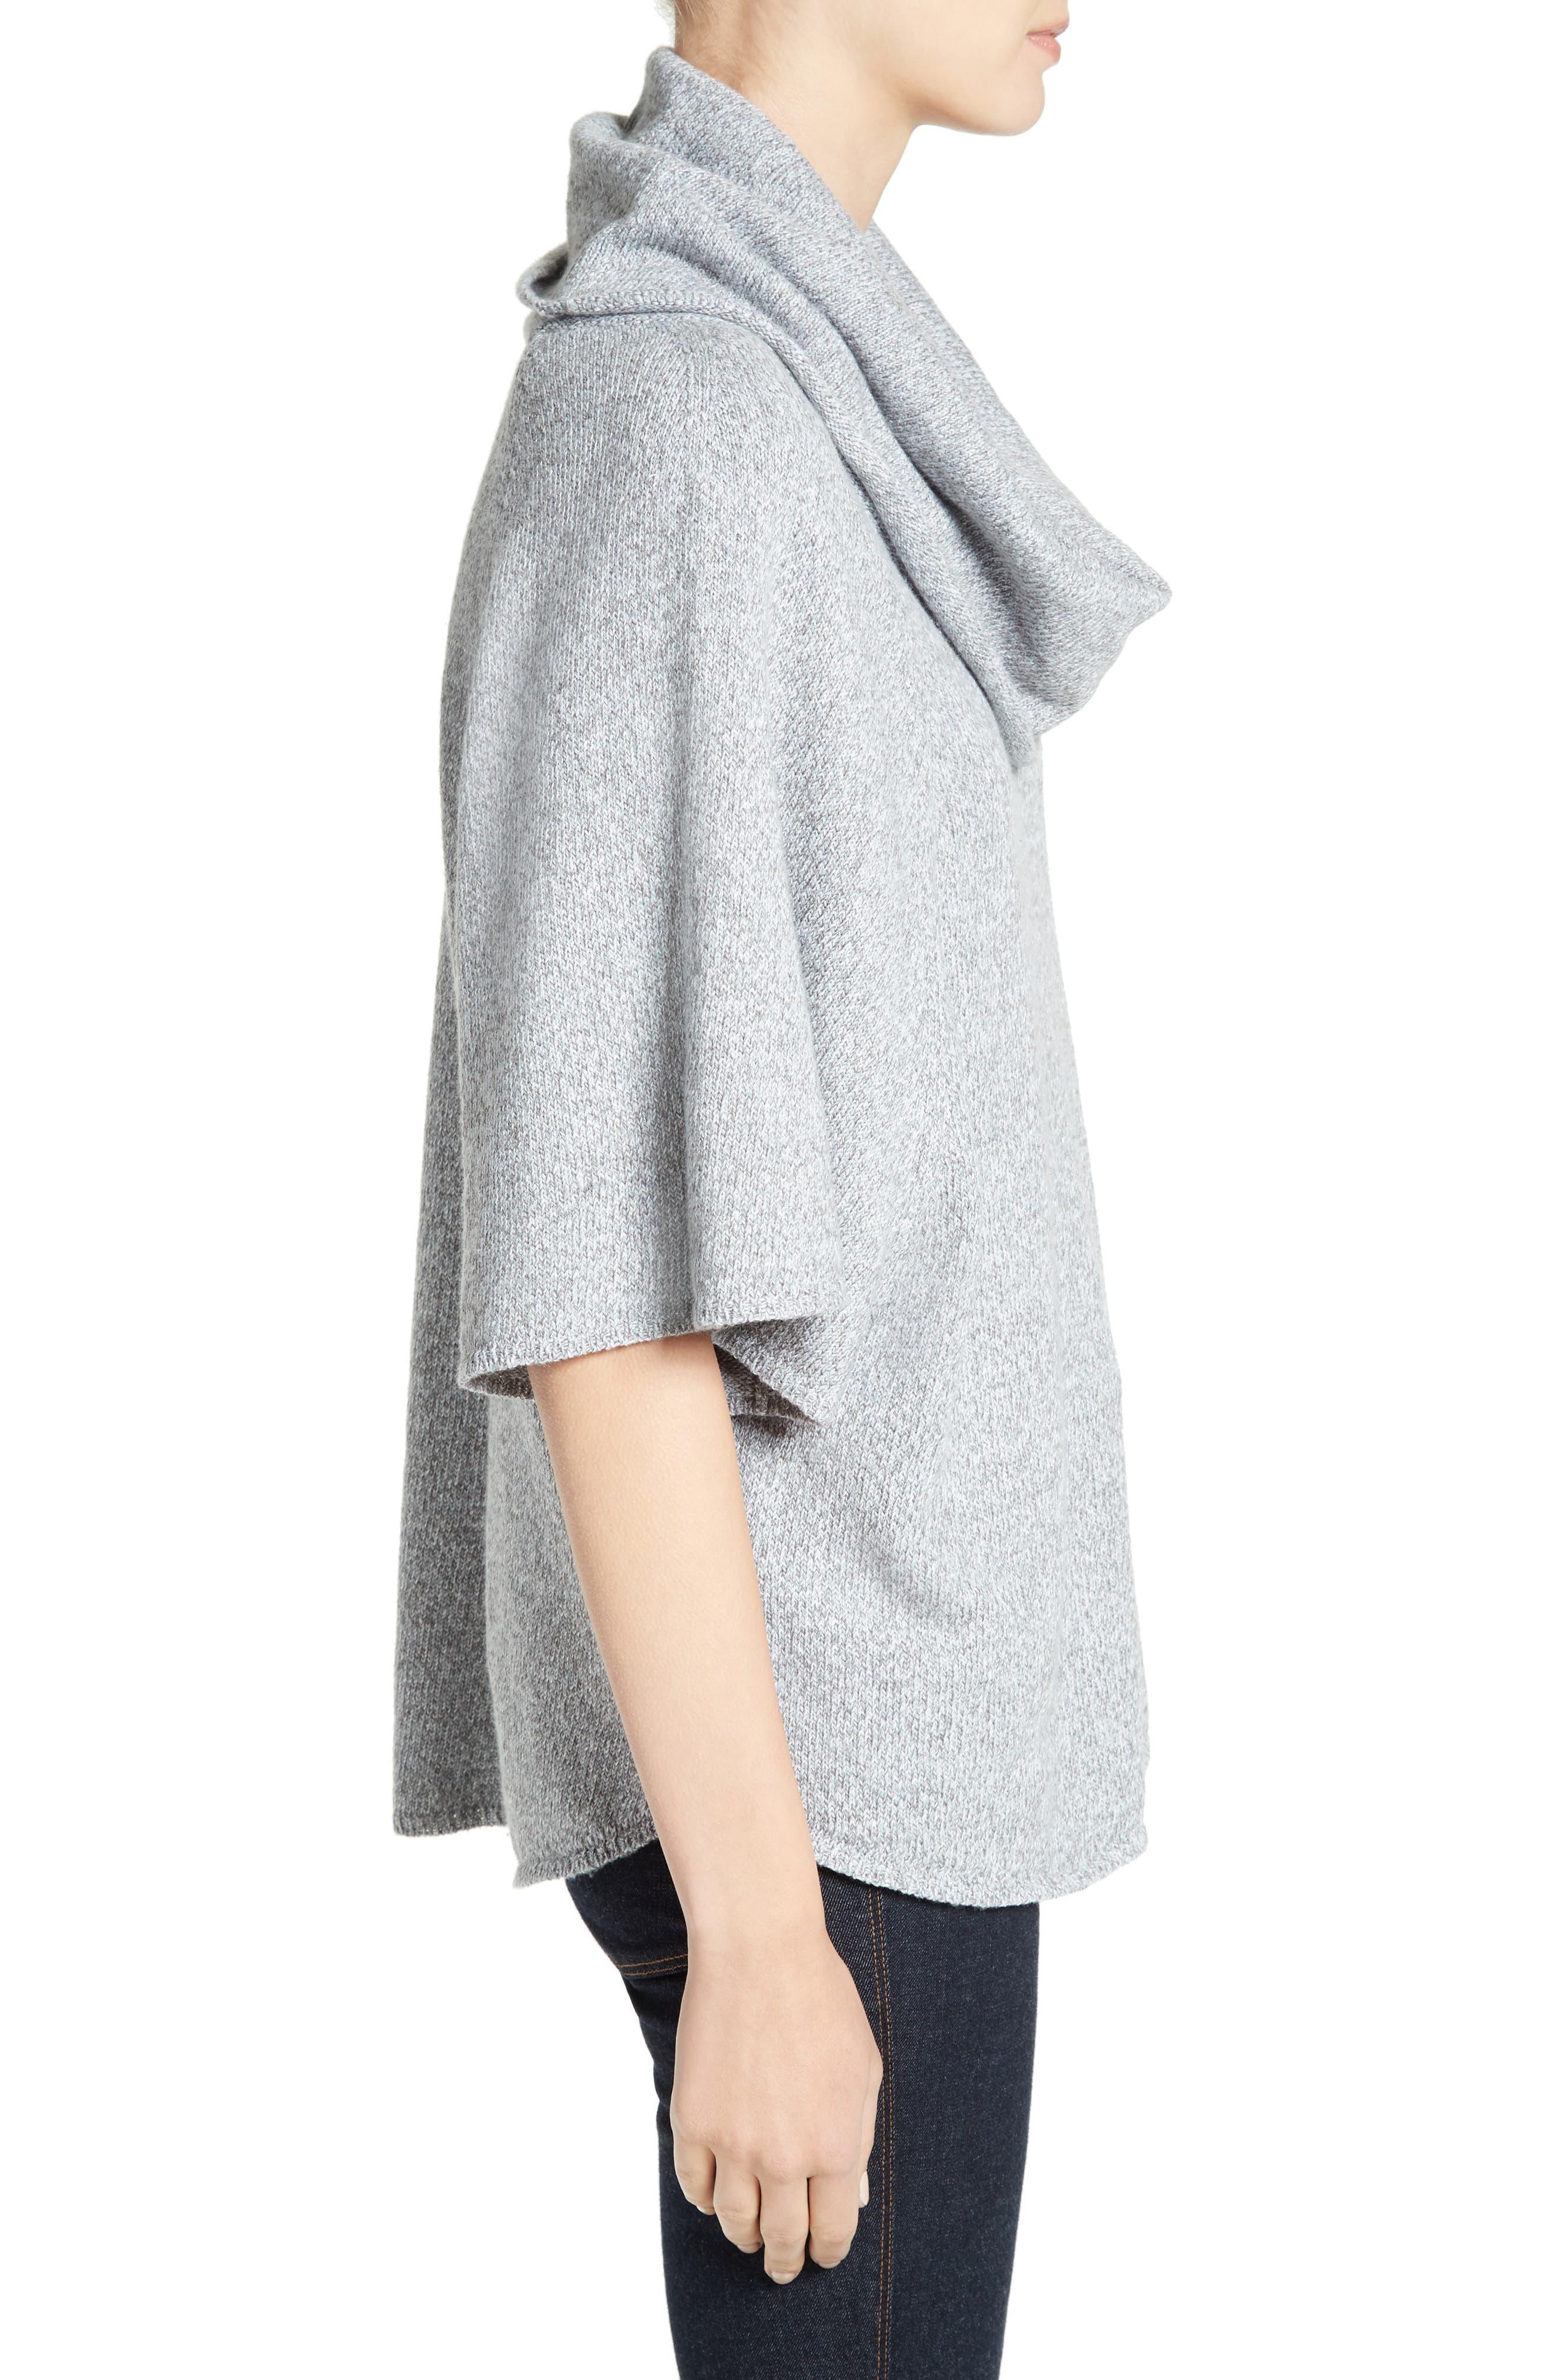 Celia Cowl Neck Sweater,                             Alternate thumbnail 3, color,                             059